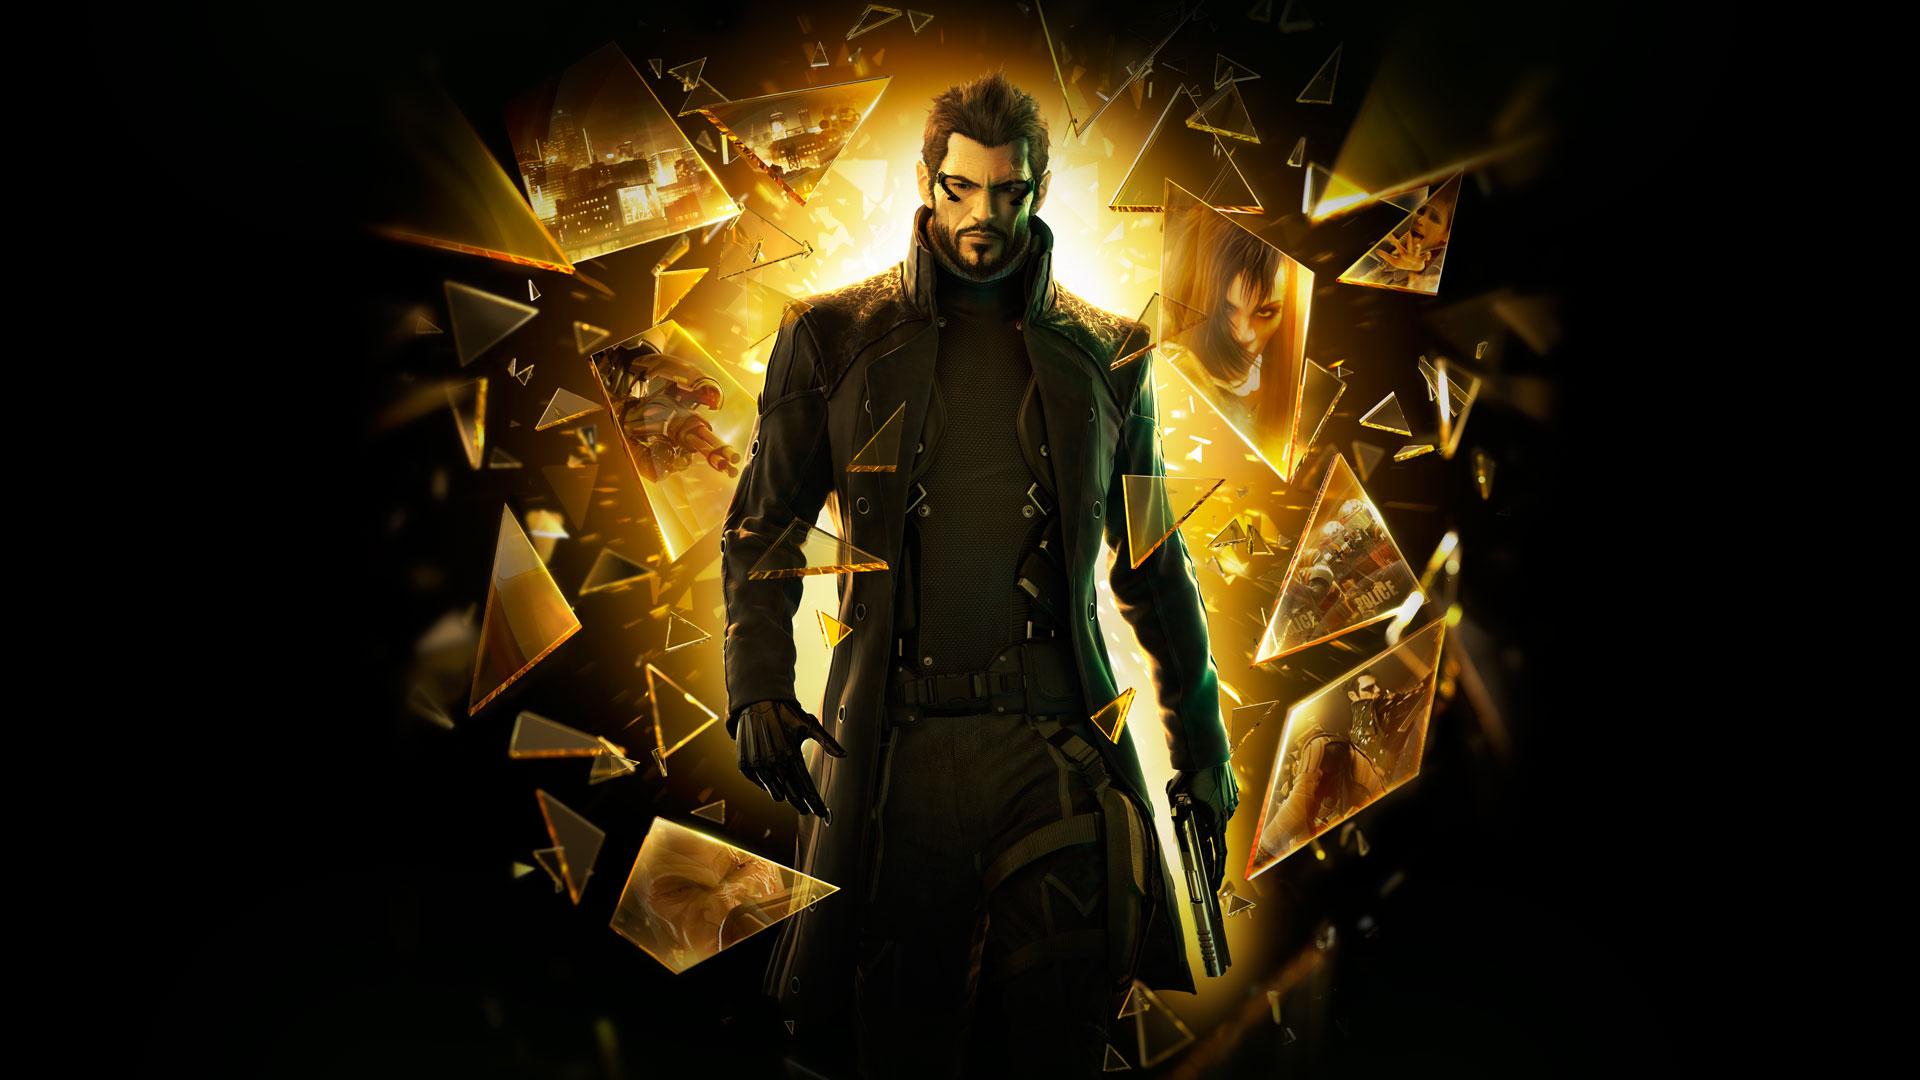 c819bd38a3cdf495f308bd2579aaf145edae8341.jpg - Deus Ex: Human Revolution